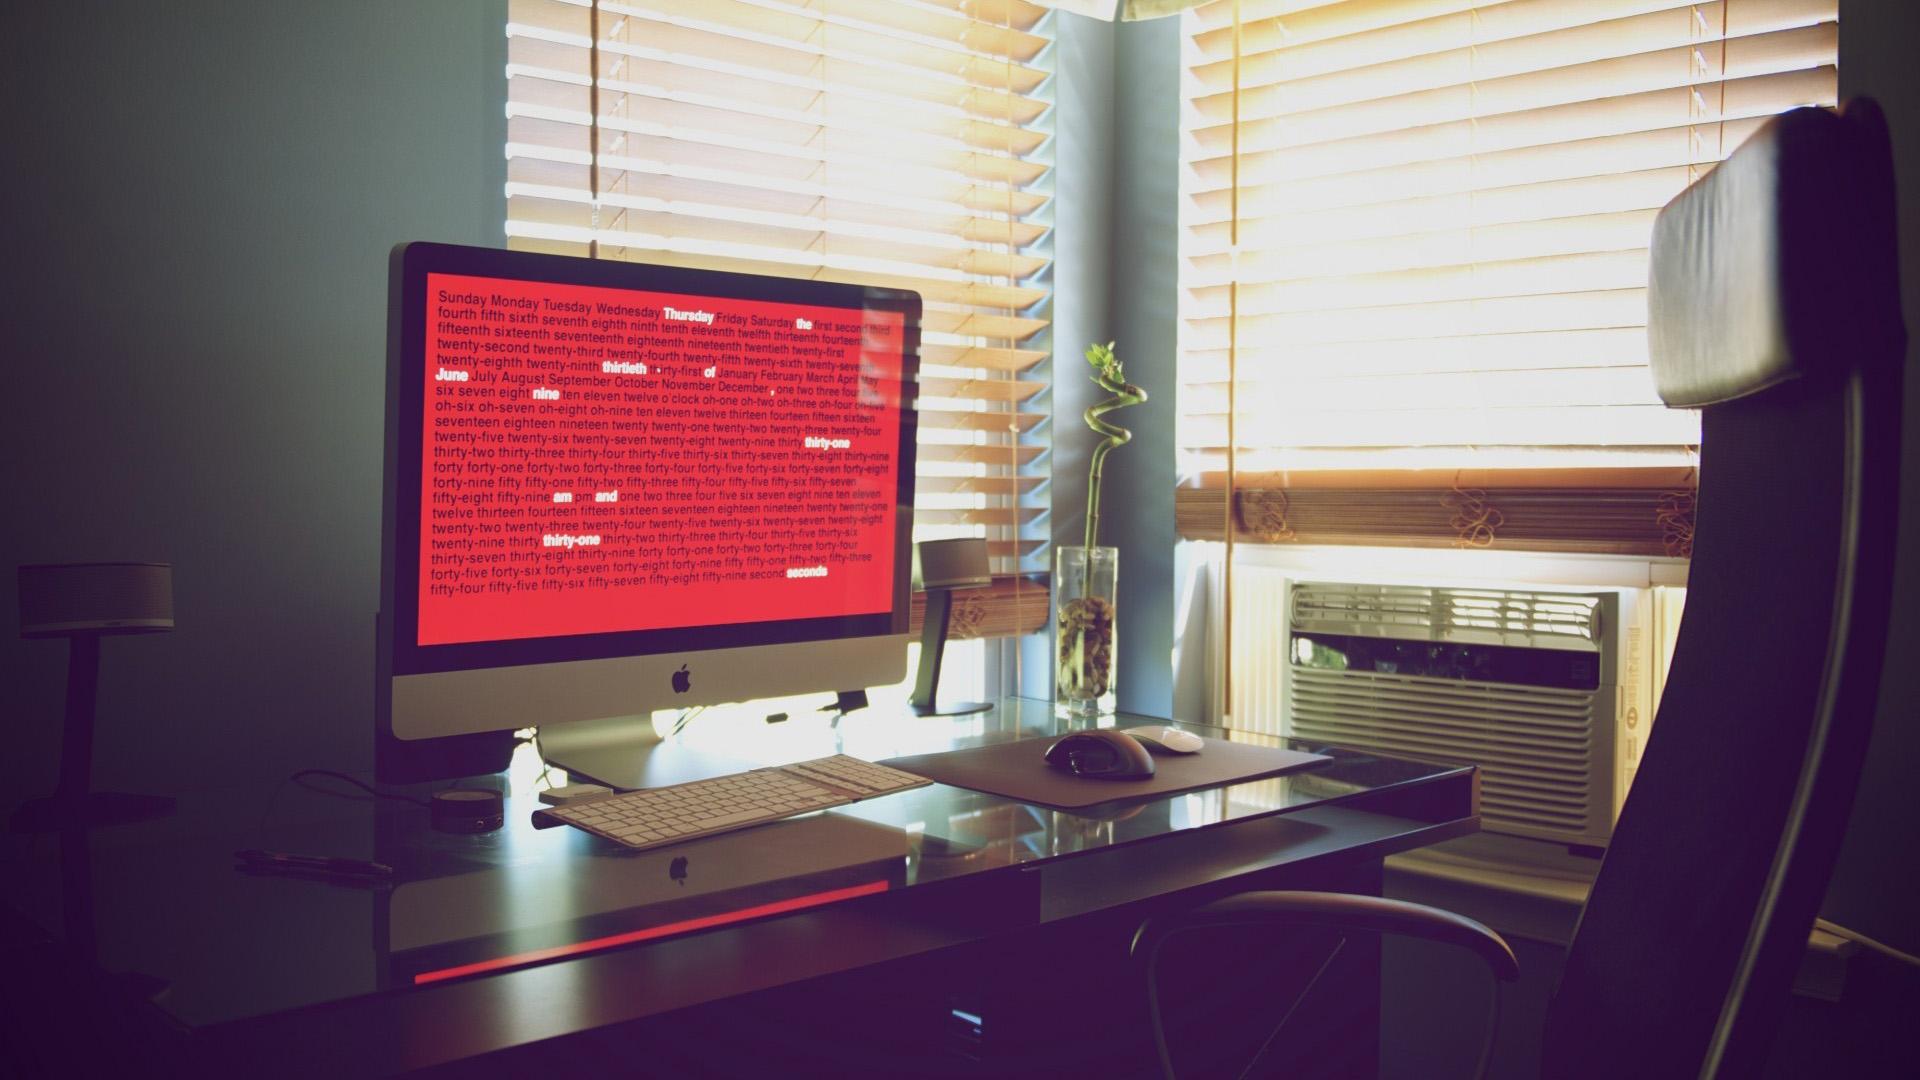 iMac Setup HD Wallpaper FullHDWpp   Full HD Wallpapers 1920x1080 1920x1080